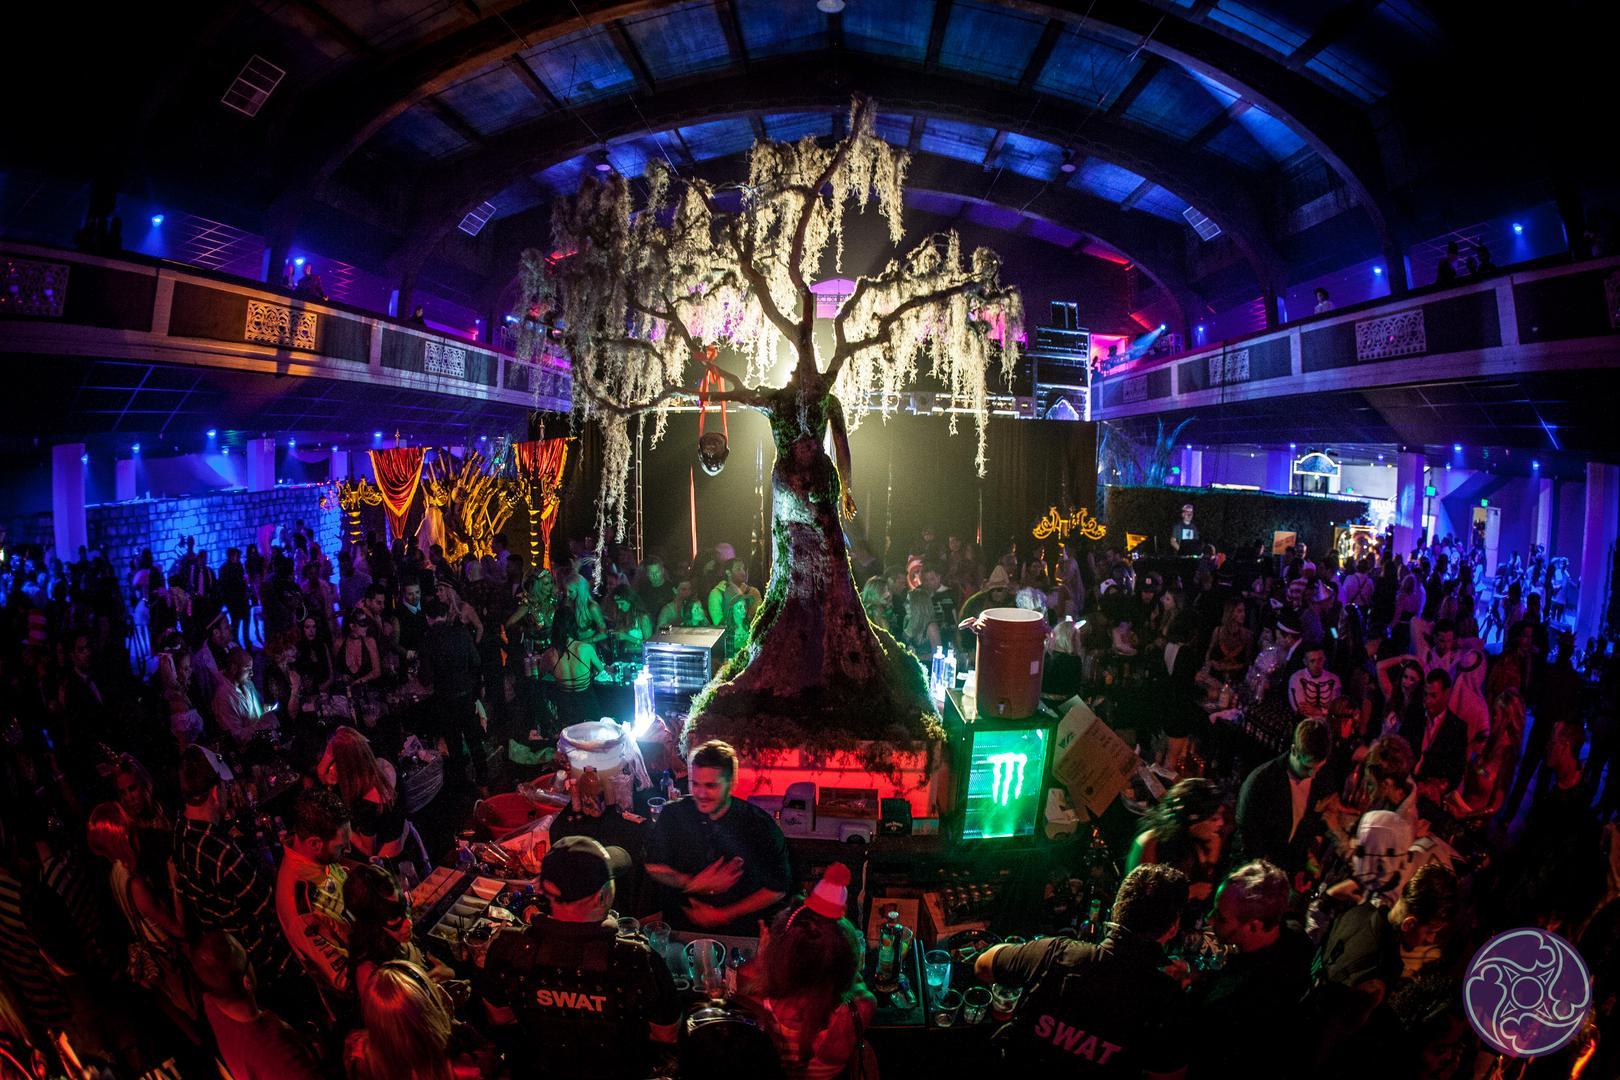 Maxim Halloween Party Features Premium Open Bars and Decadent Cuisine